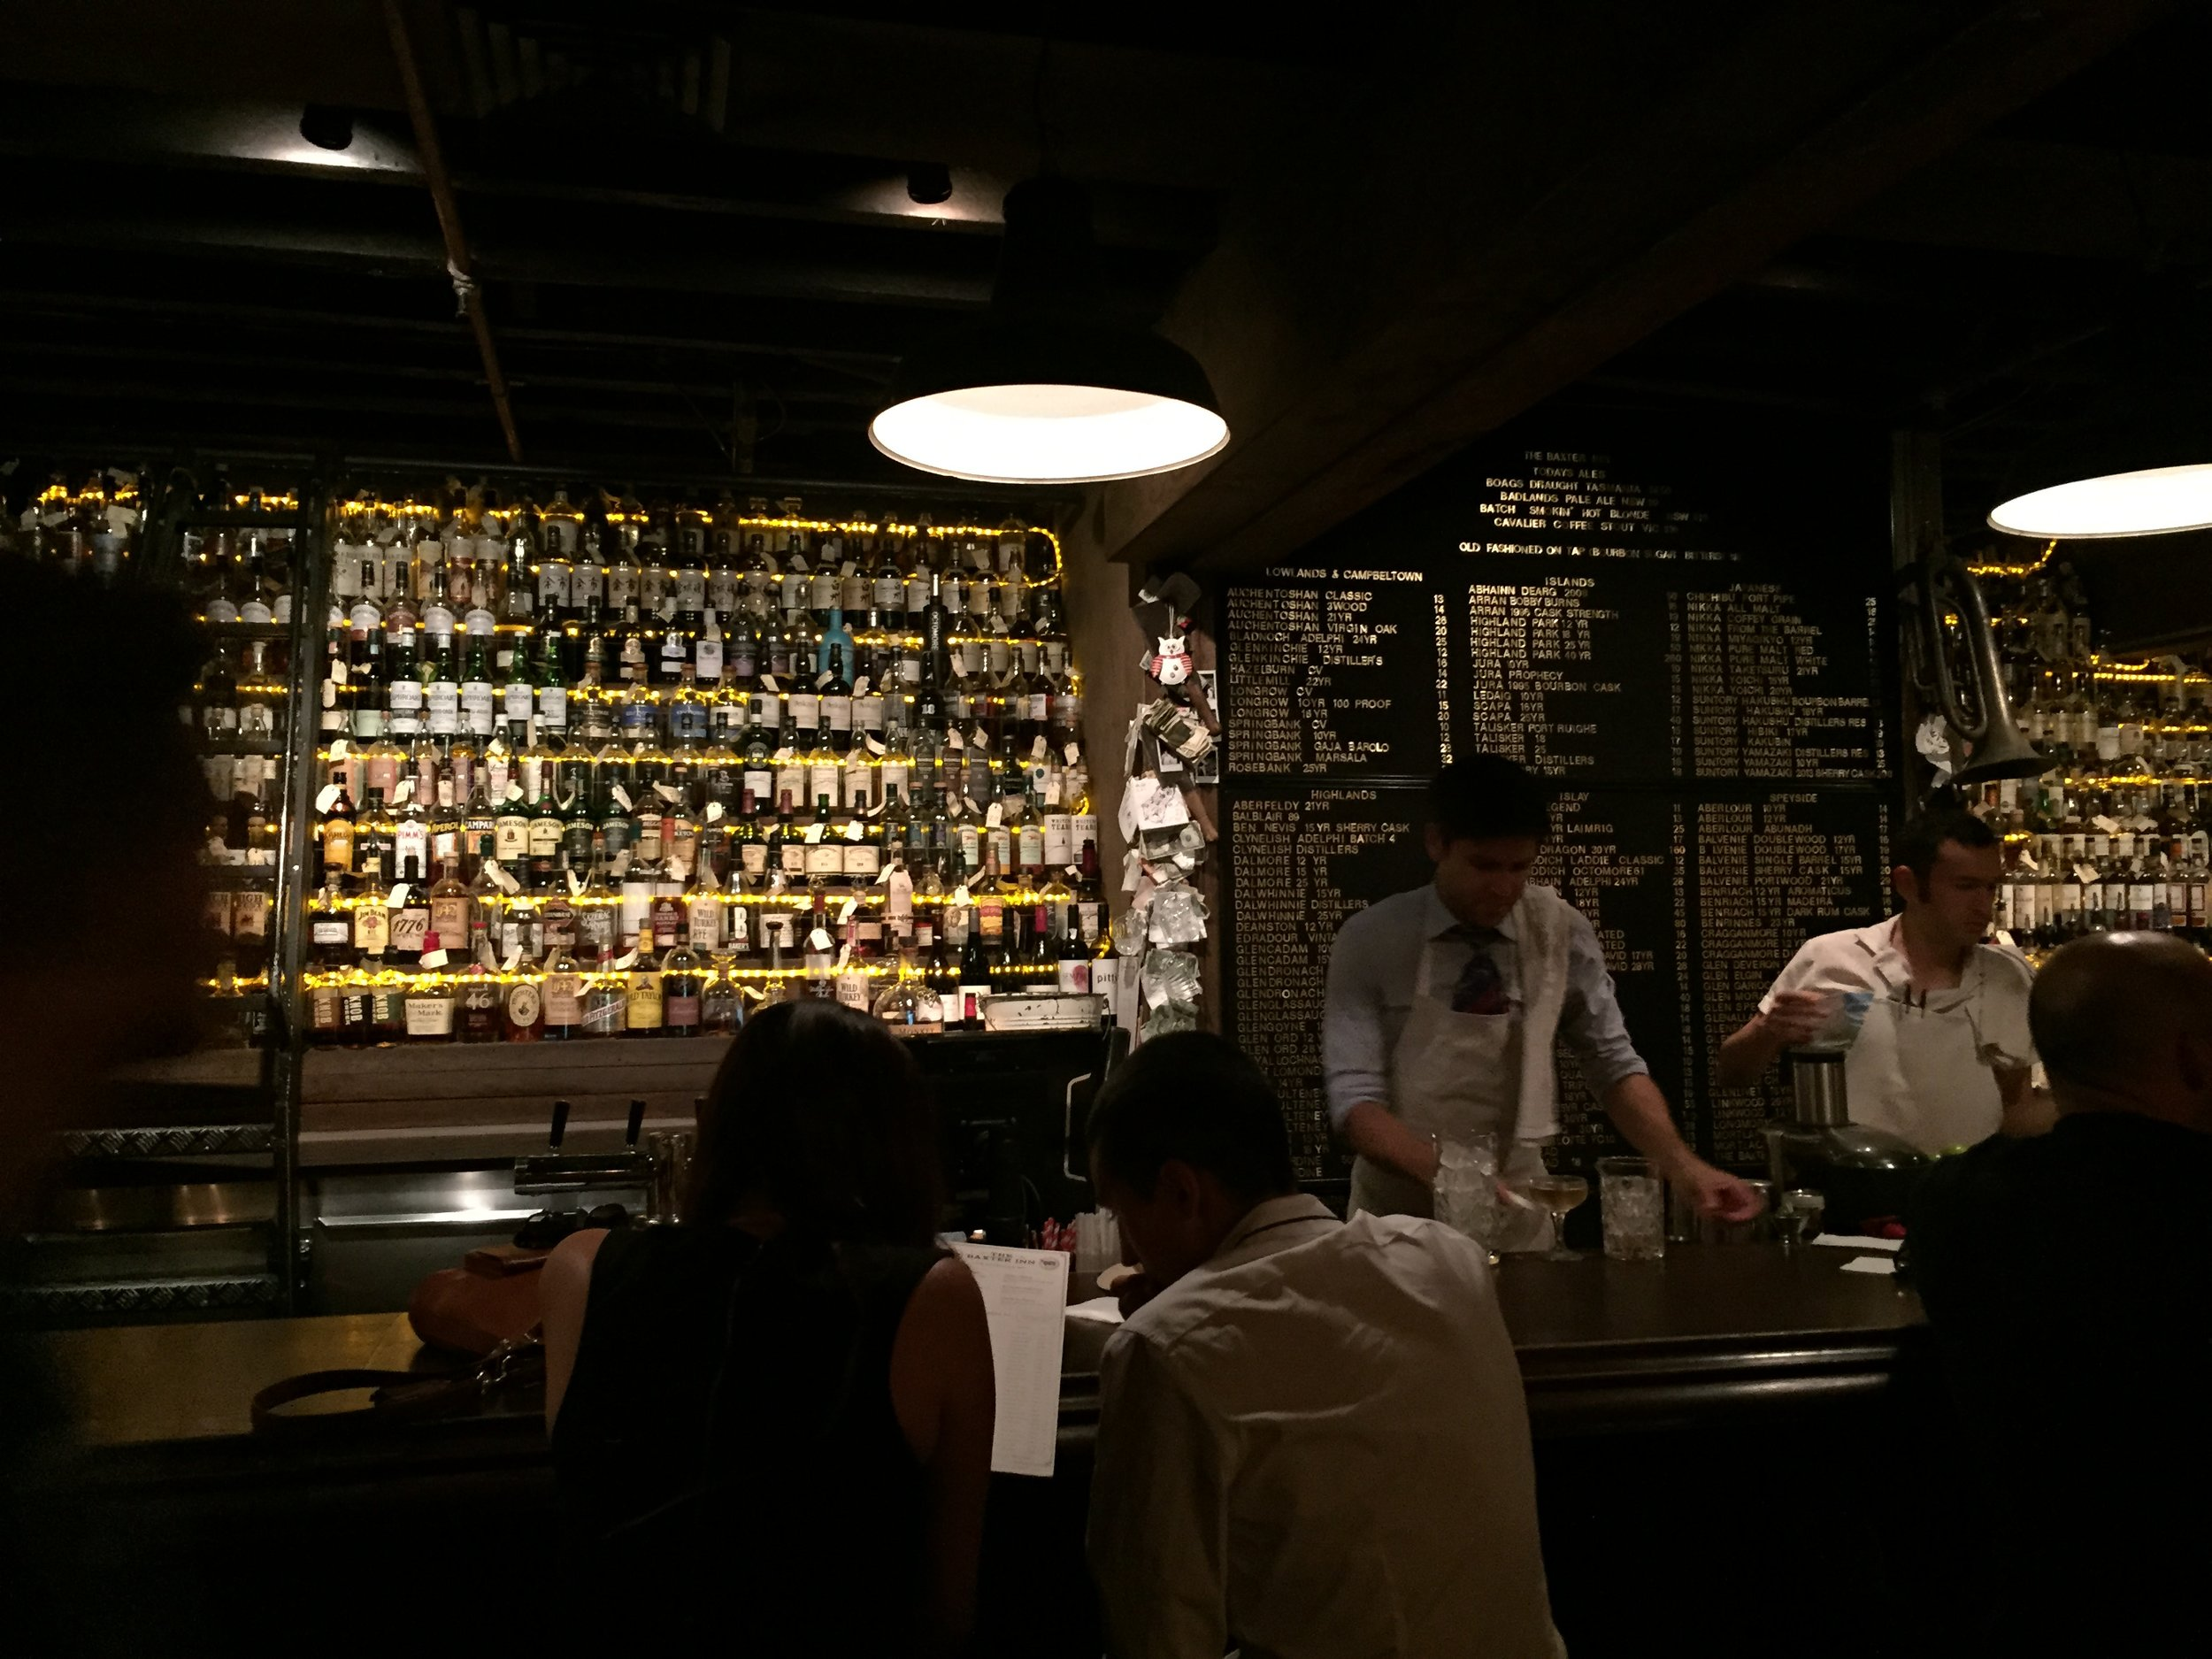 Baxter Inn Speakeasy - Sydney, Australia